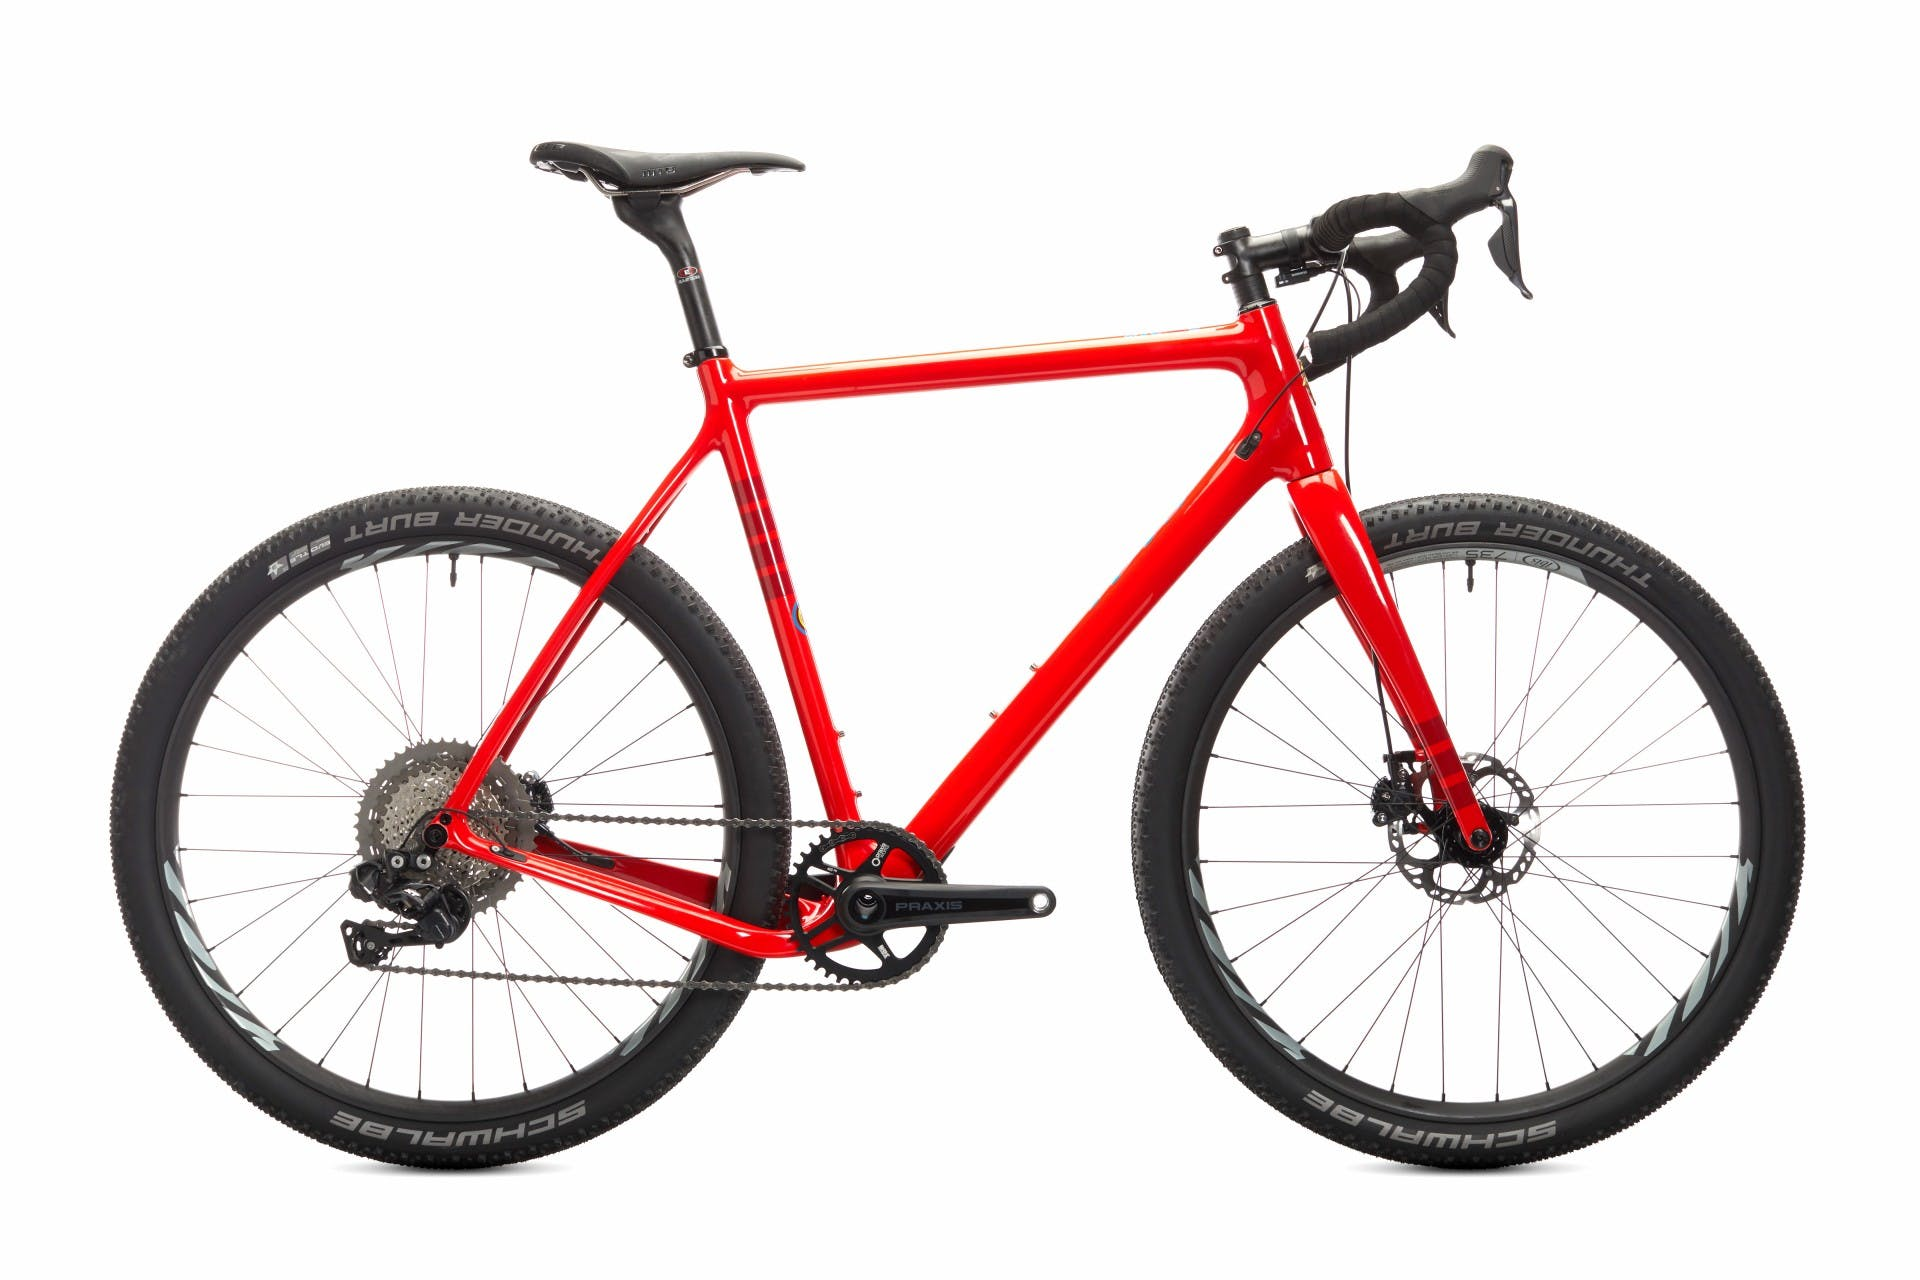 Bicicletta gravel Ibis Hakka MX rossa, vista laterale destra